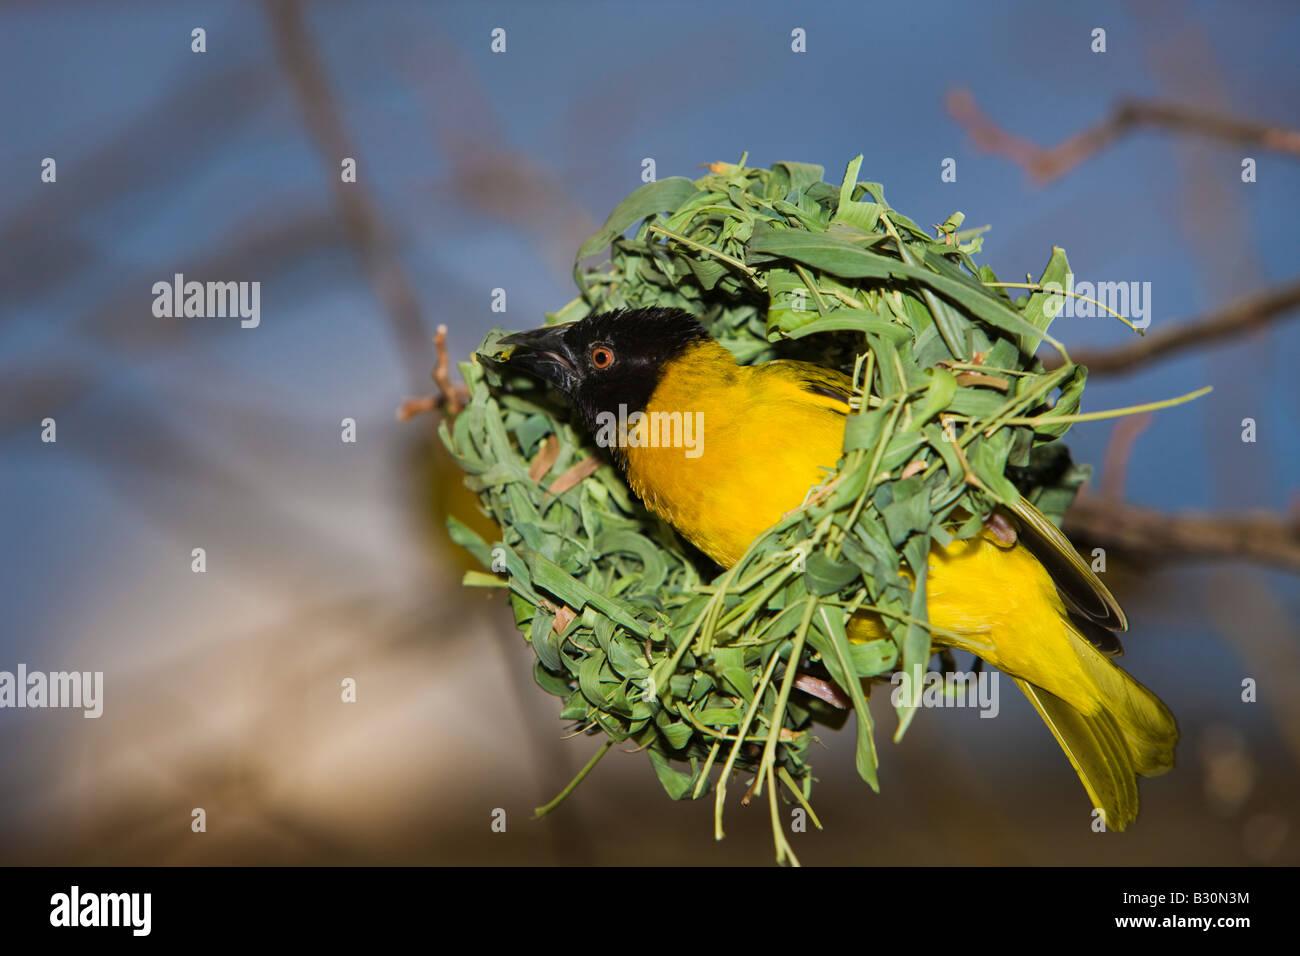 http://c8.alamy.com/comp/B30N3M/vitelline-masked-weaver-textor-vitellinus-ploceus-vitellinus-tanzania-B30N3M.jpg